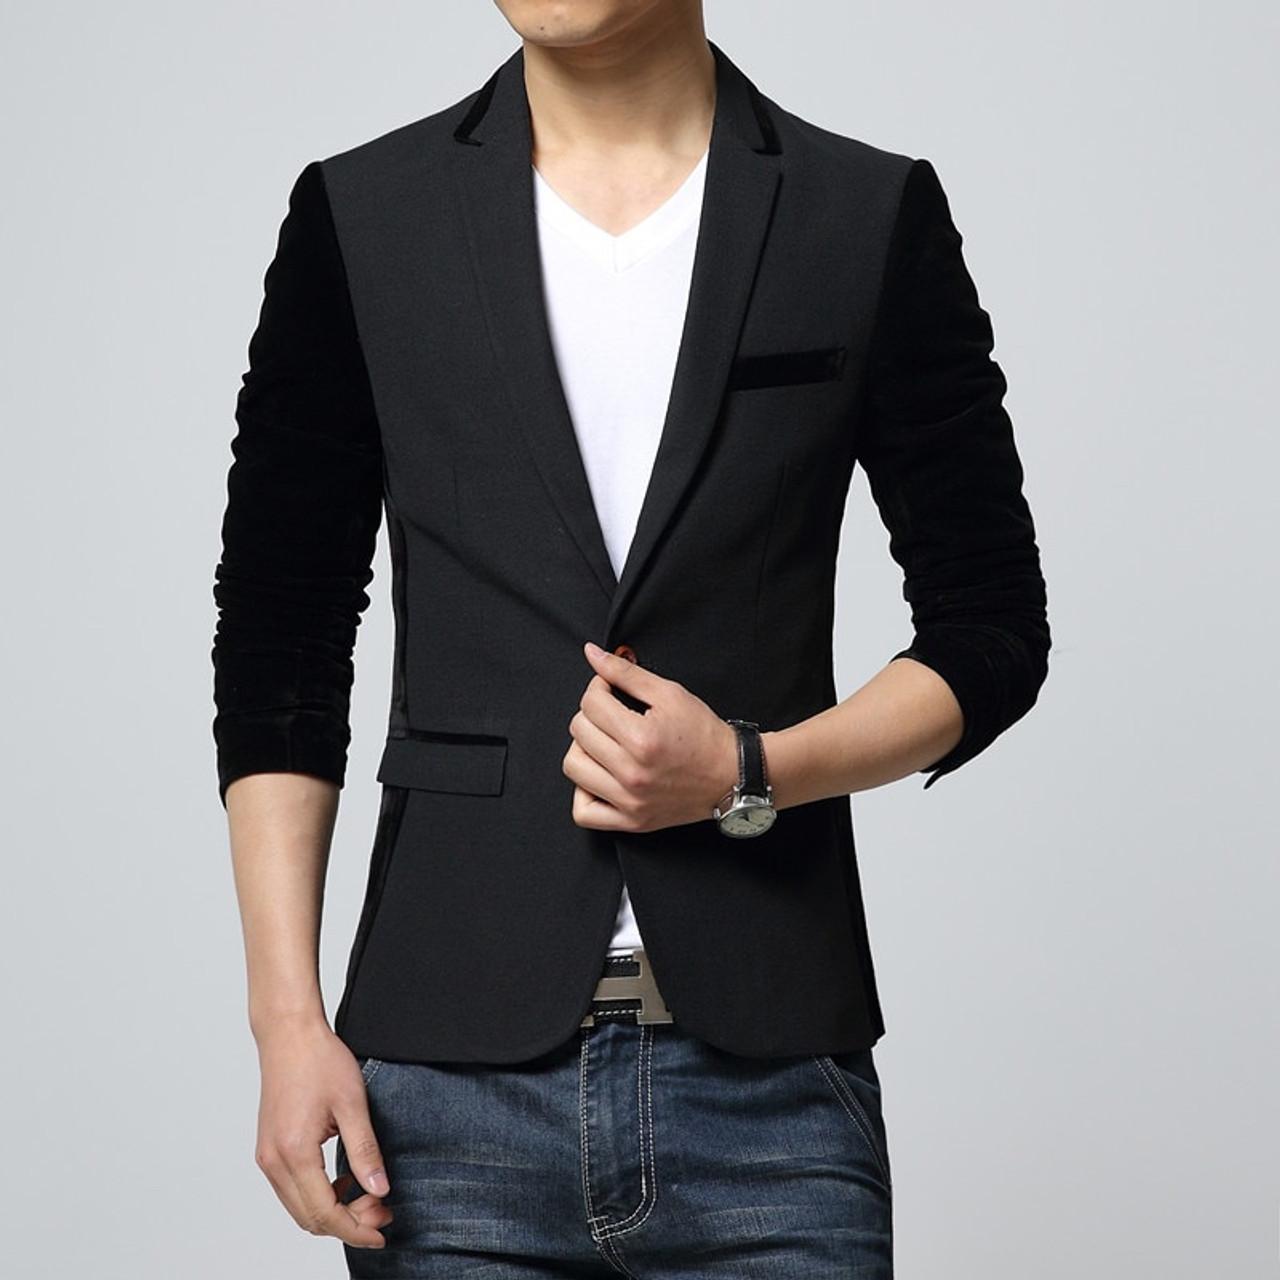 6f9410afc76 ... 2018 New Korean Fashion Mens Slim fit Blazer coat suit jacket Male  casual unique blaser masculino ...